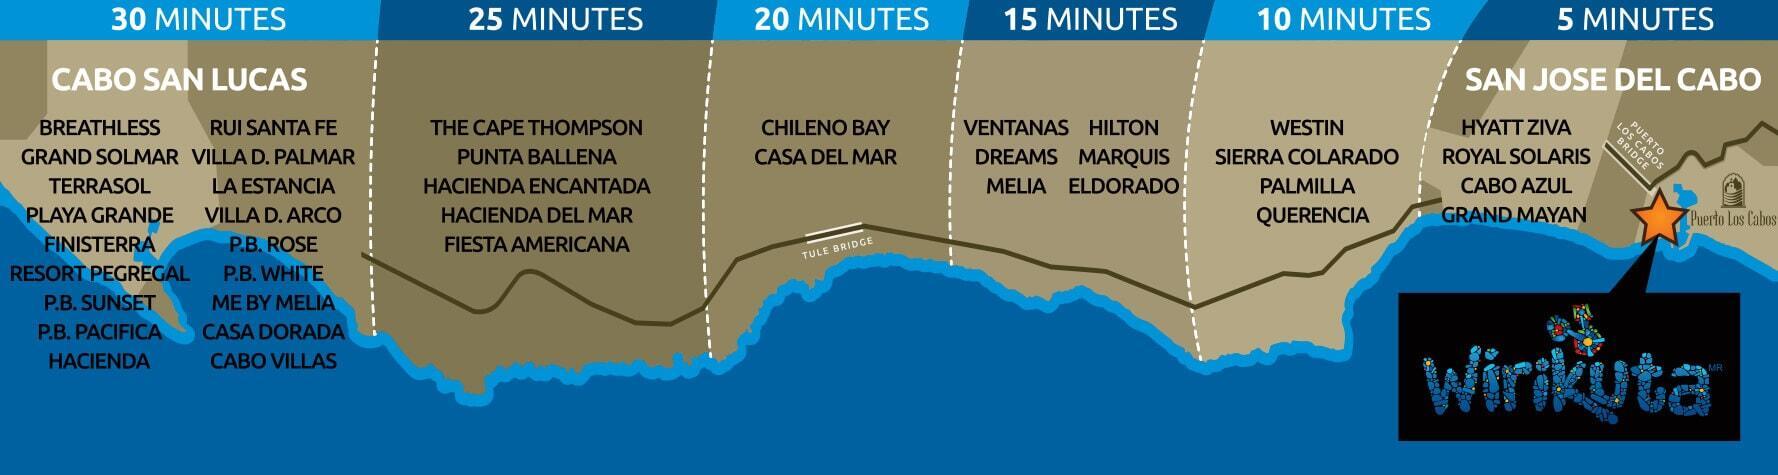 wirikuta dinner show los cabos location map